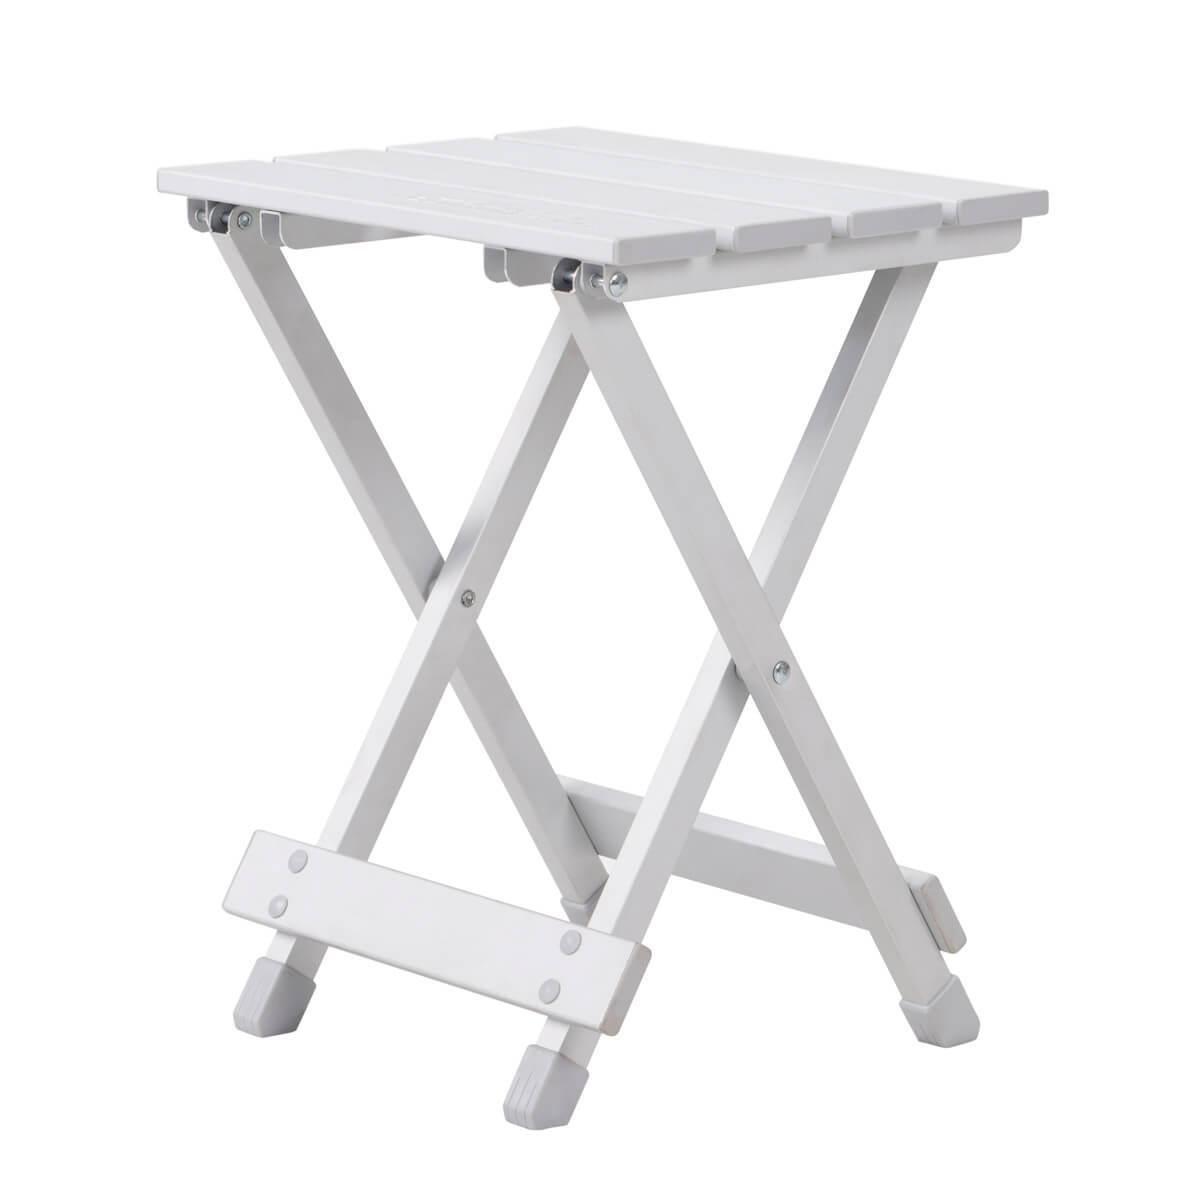 Folding Sidekick Table